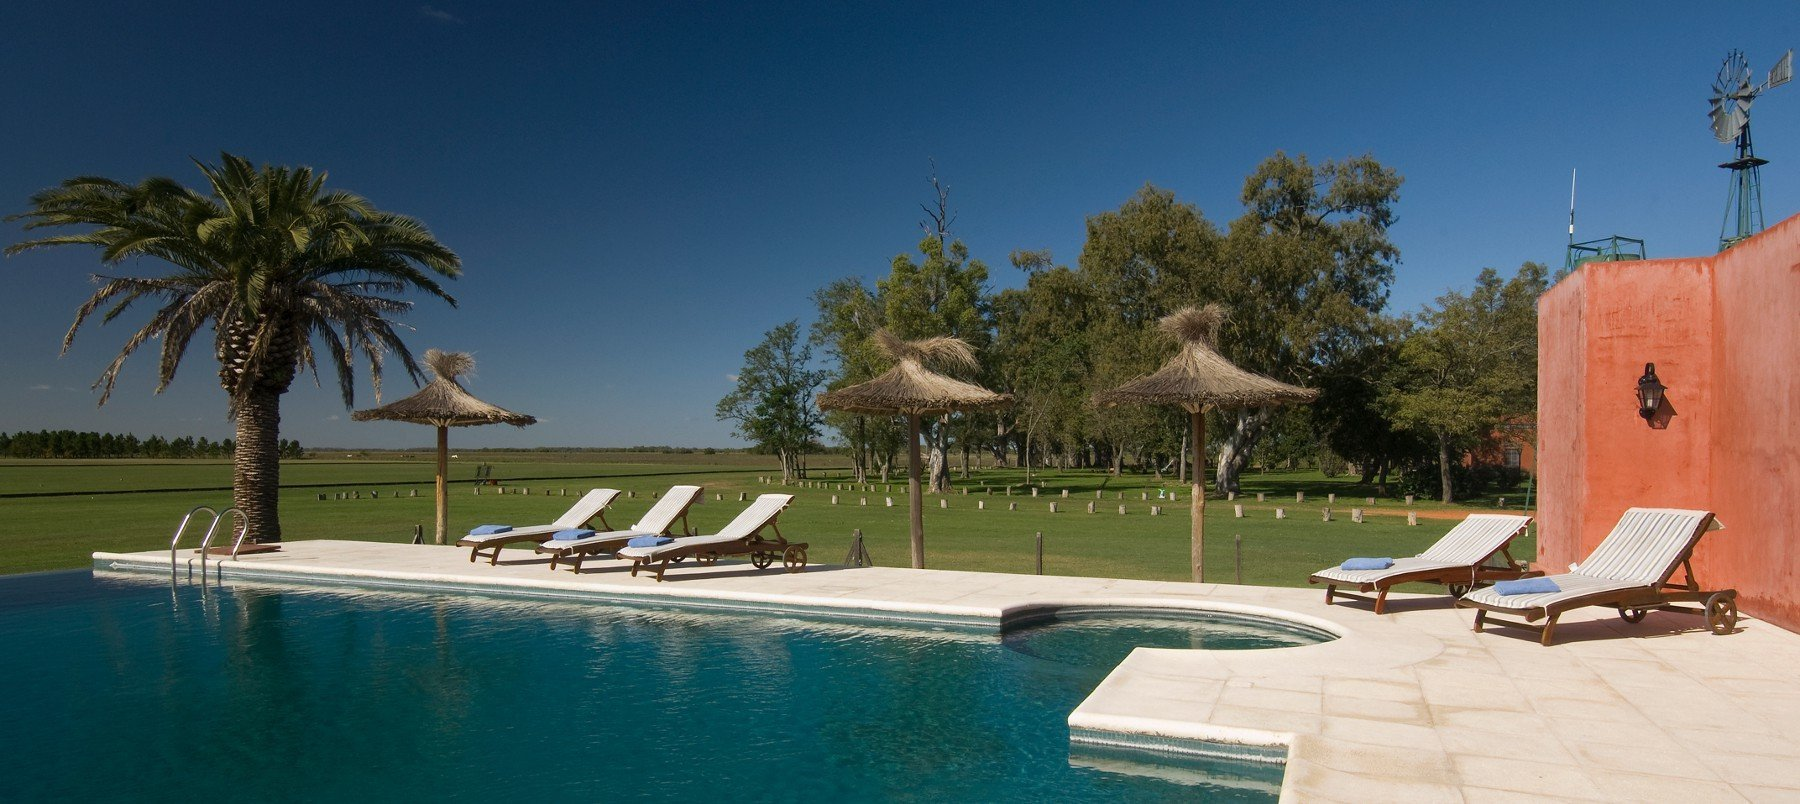 puesto-viejo-estancia-argentina_carousel_accommodations-1_pool-1800x804.jpg